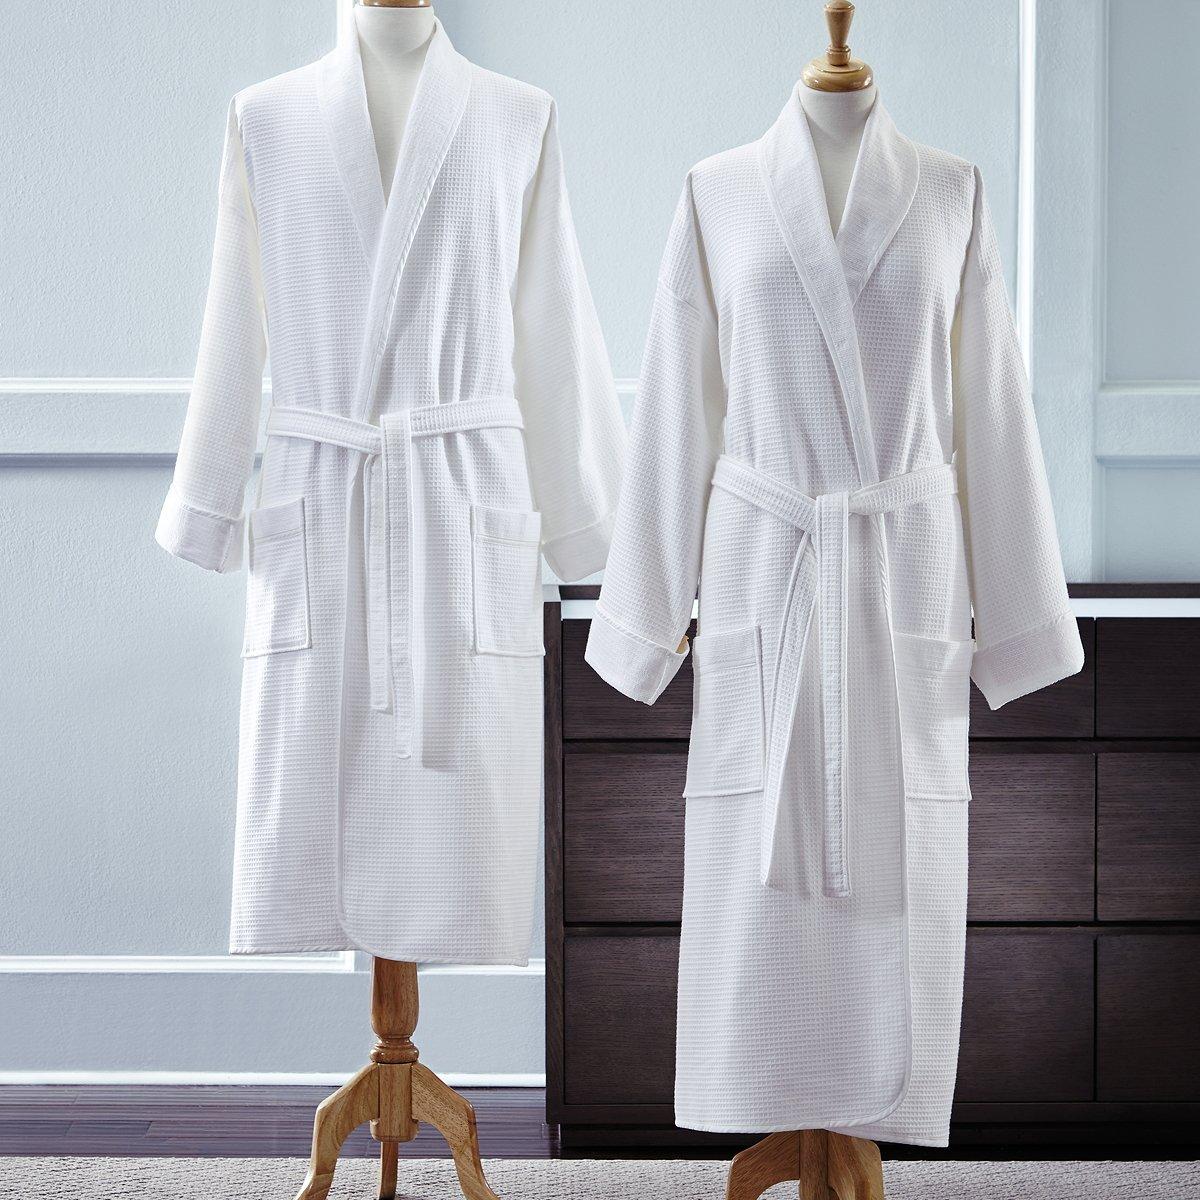 Sferra Berkley Bath Robe, Terry/ Waffle, White